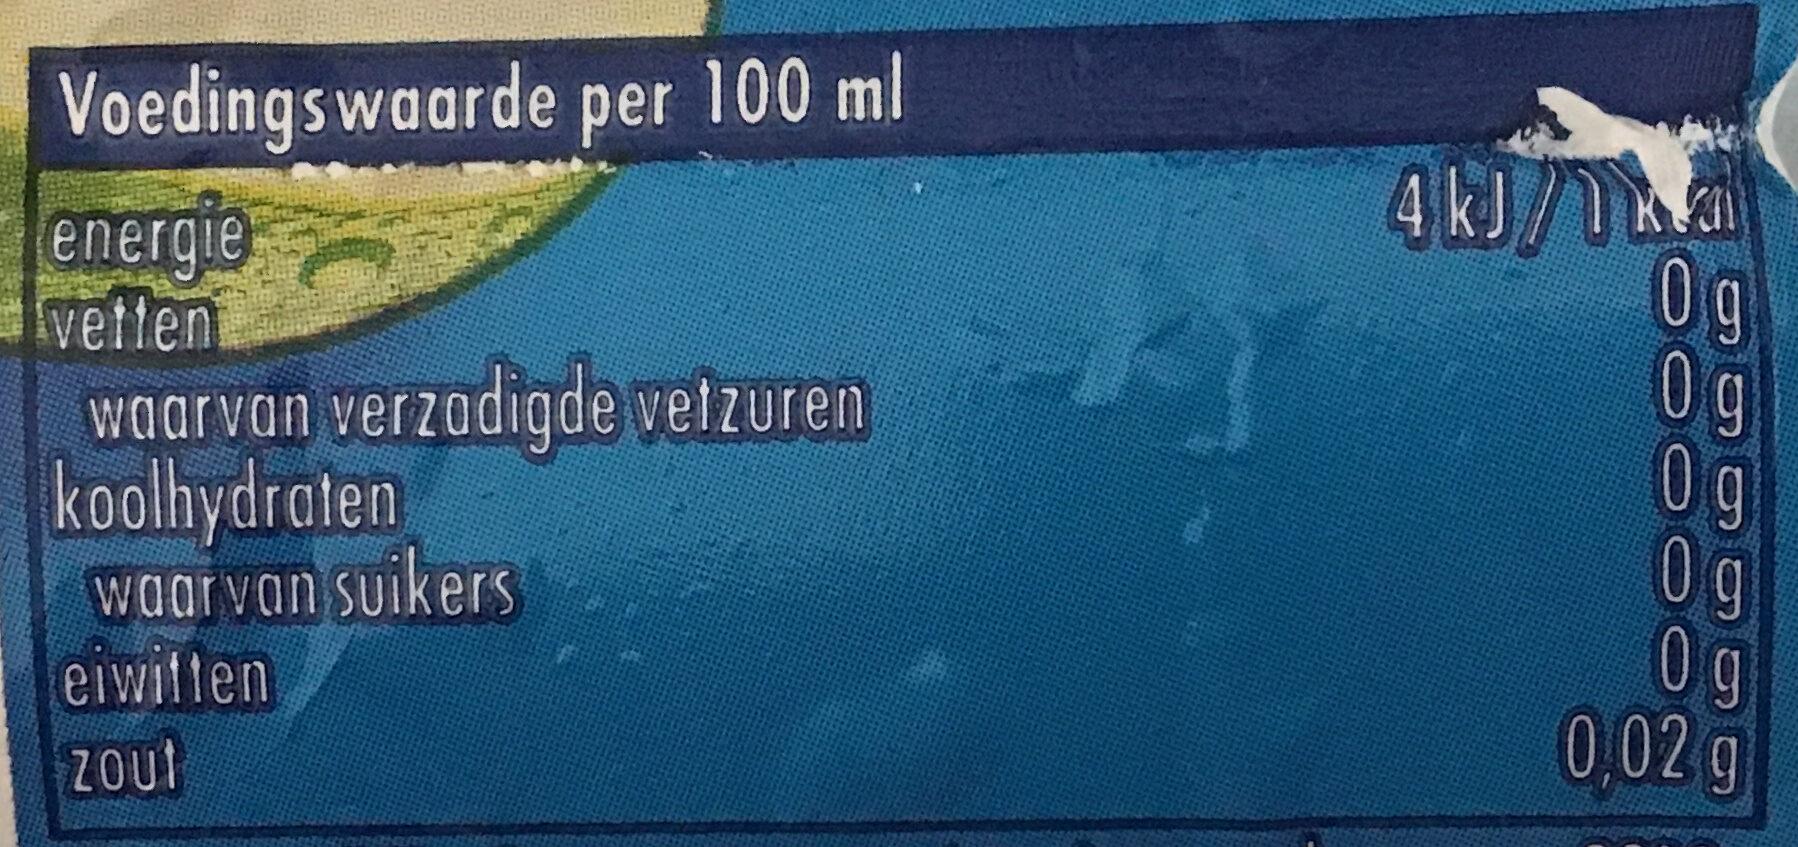 Apple - Voedingswaarden - nl